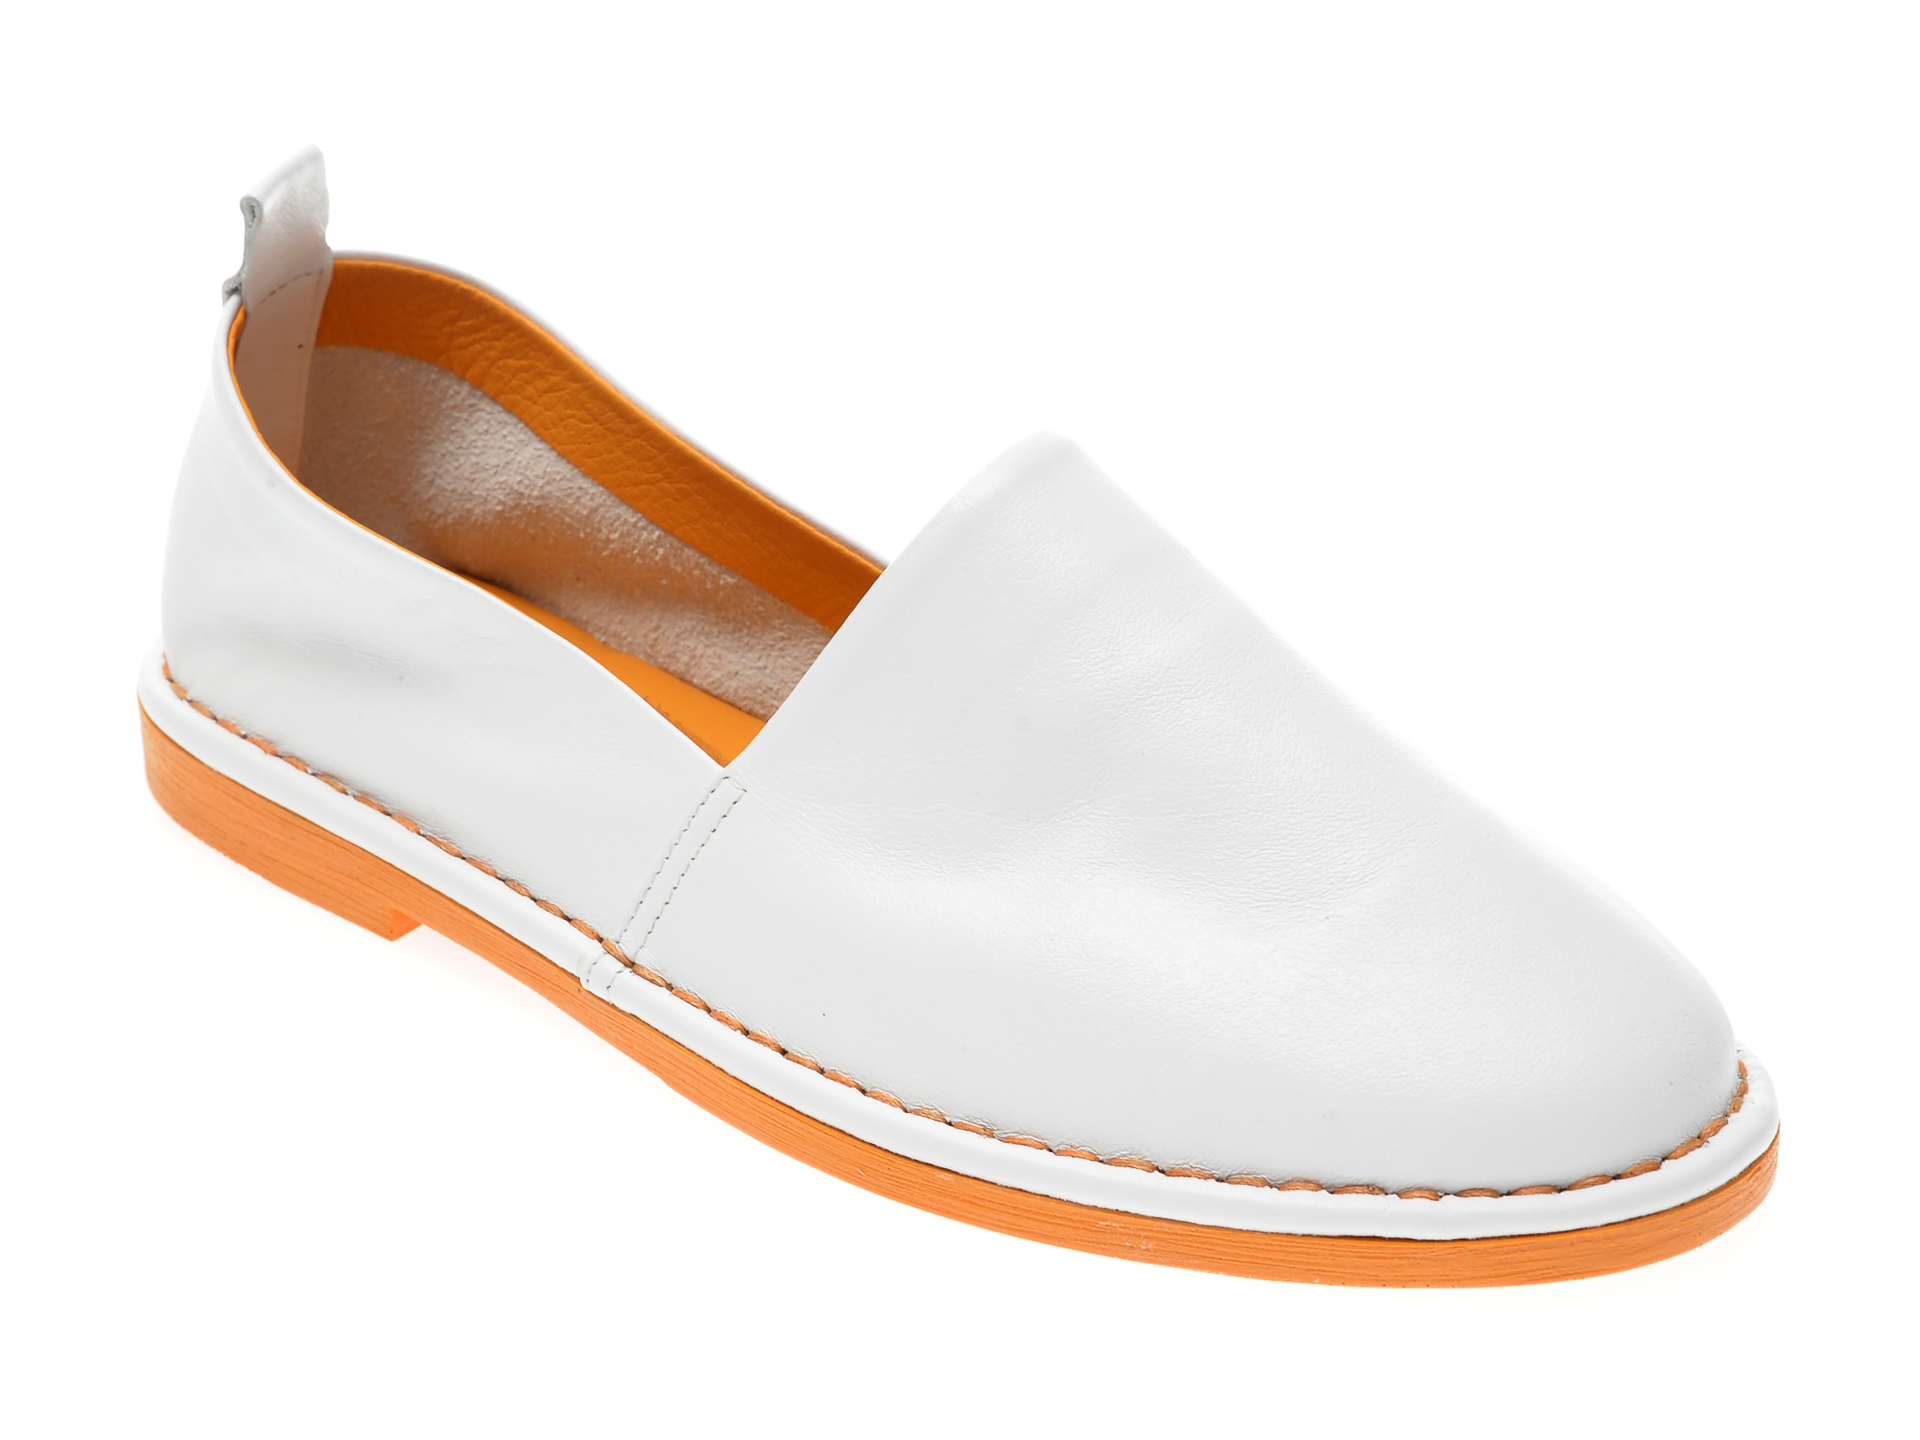 Pantofi LE BERDE albi, 6, din piele naturala New